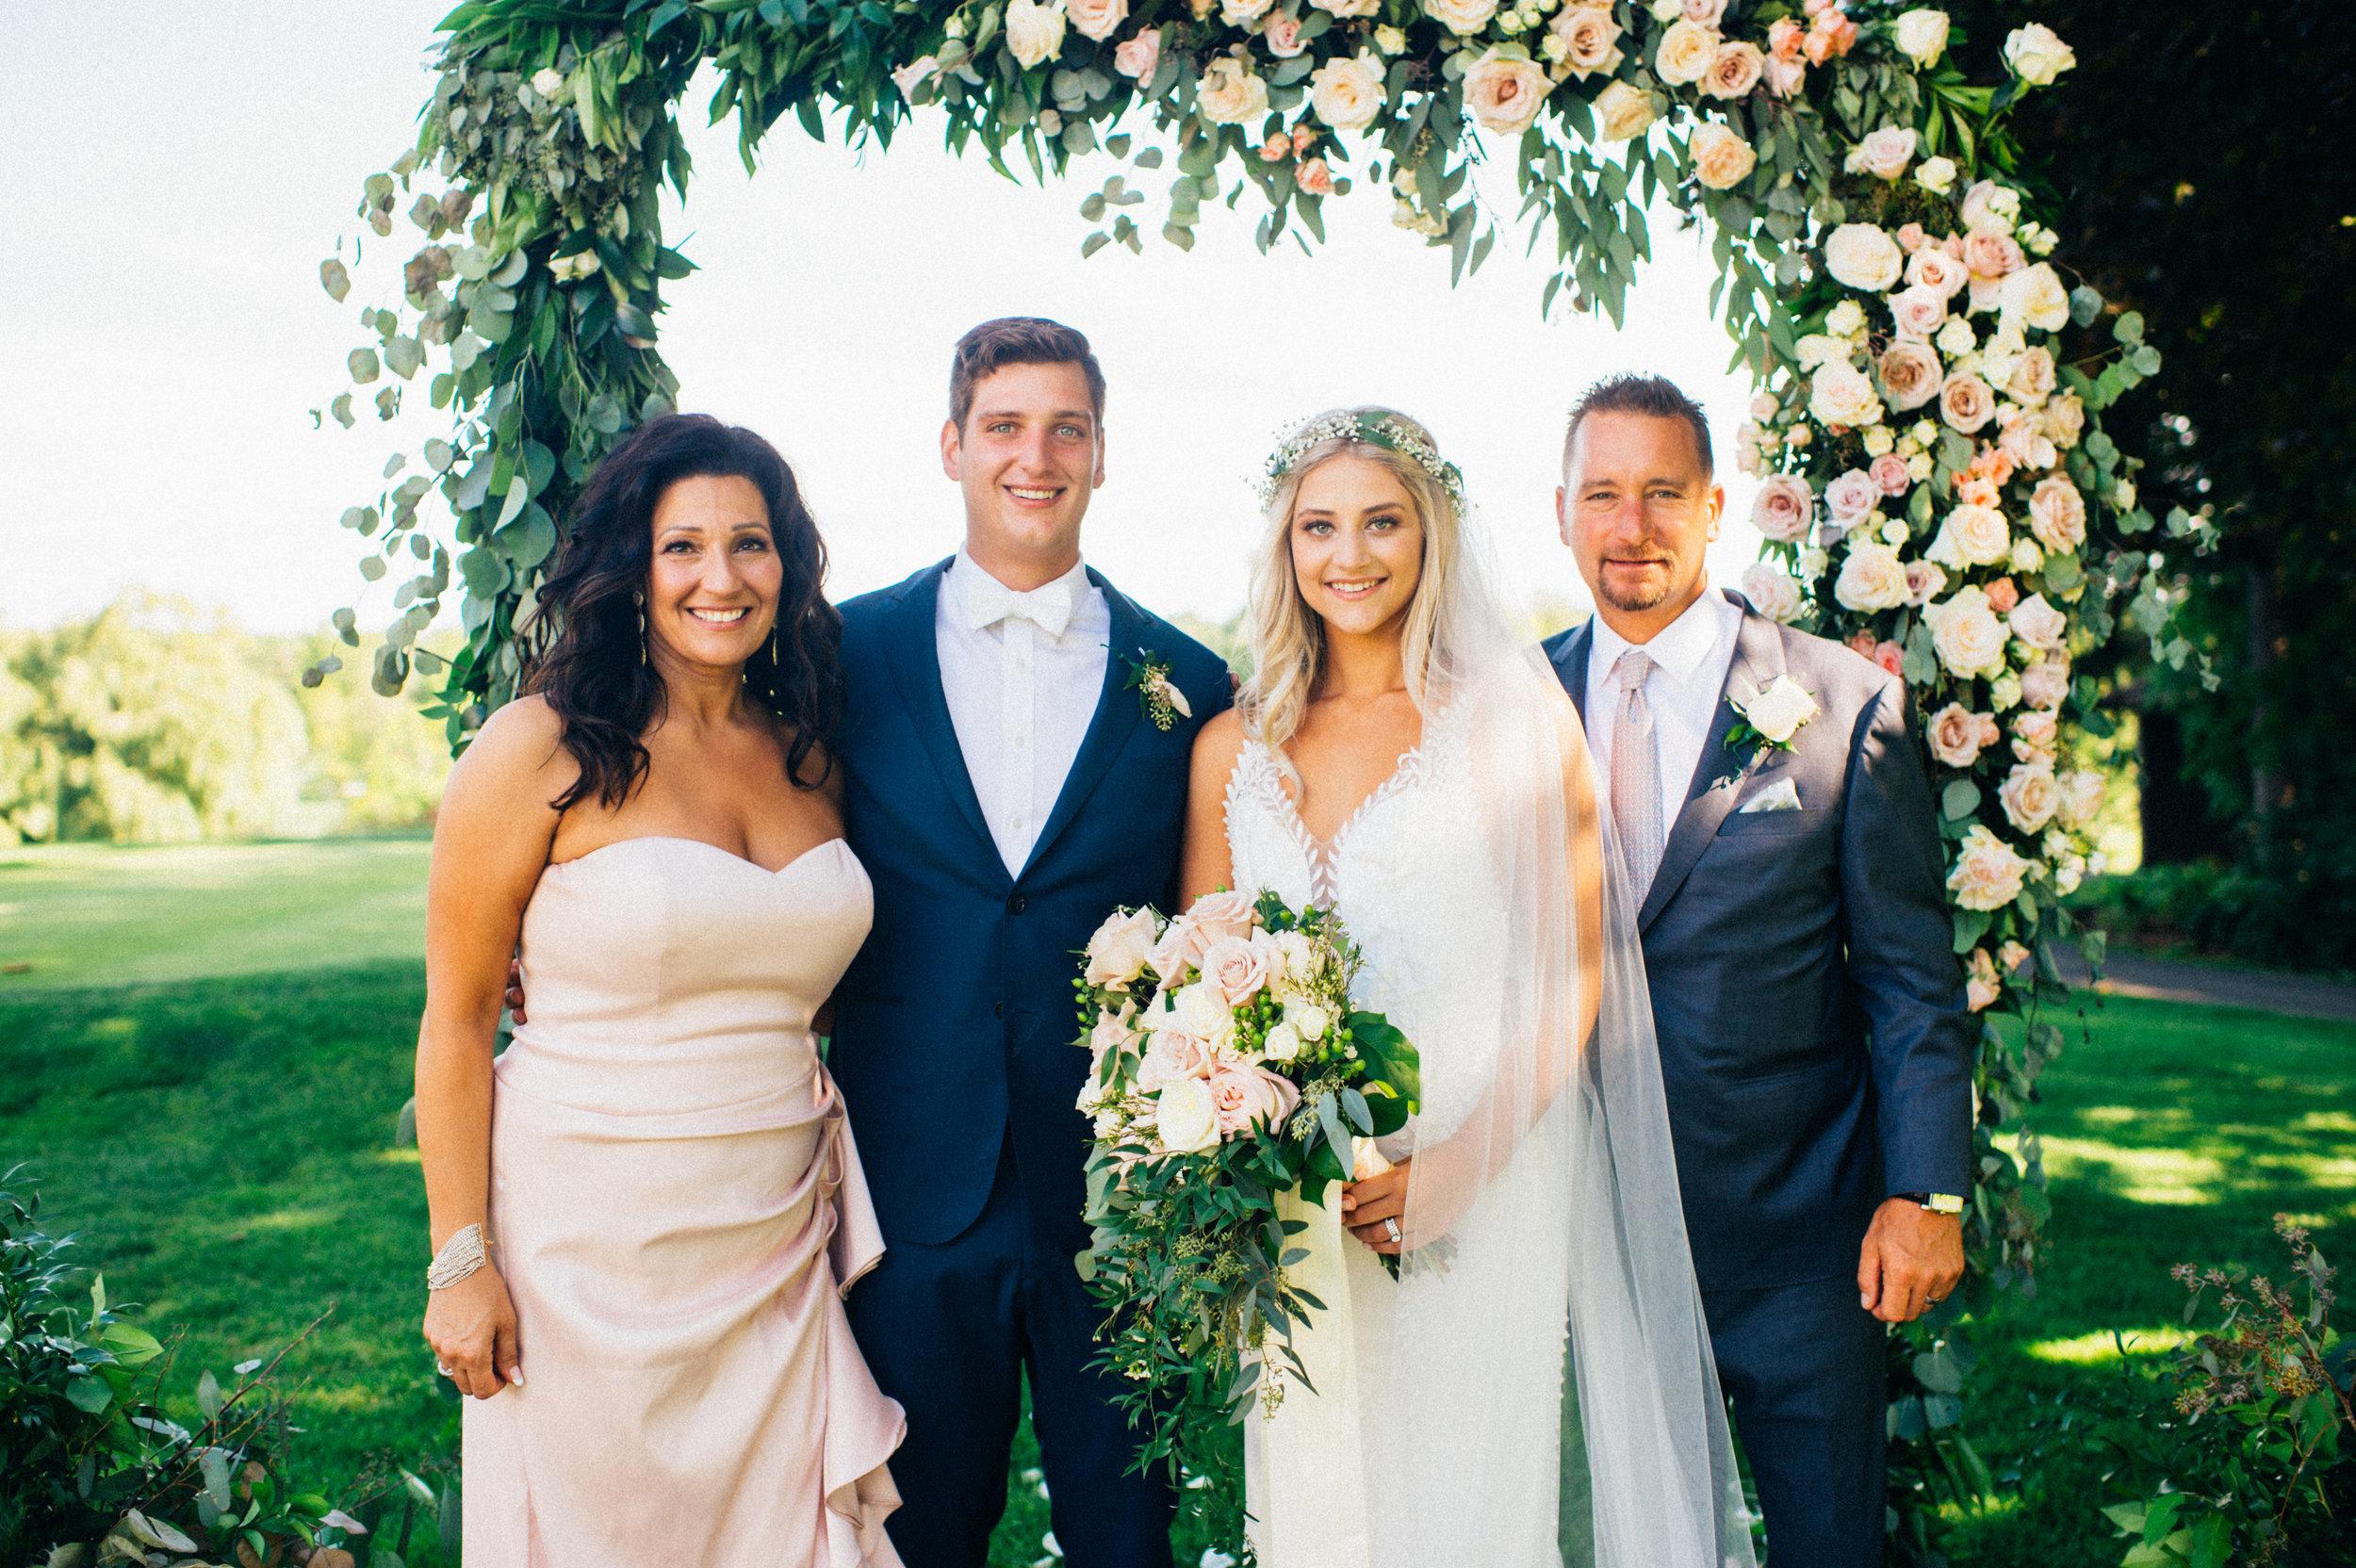 Jon Lia wedding day-Family Portraits Cocktail Hour-0001.jpg